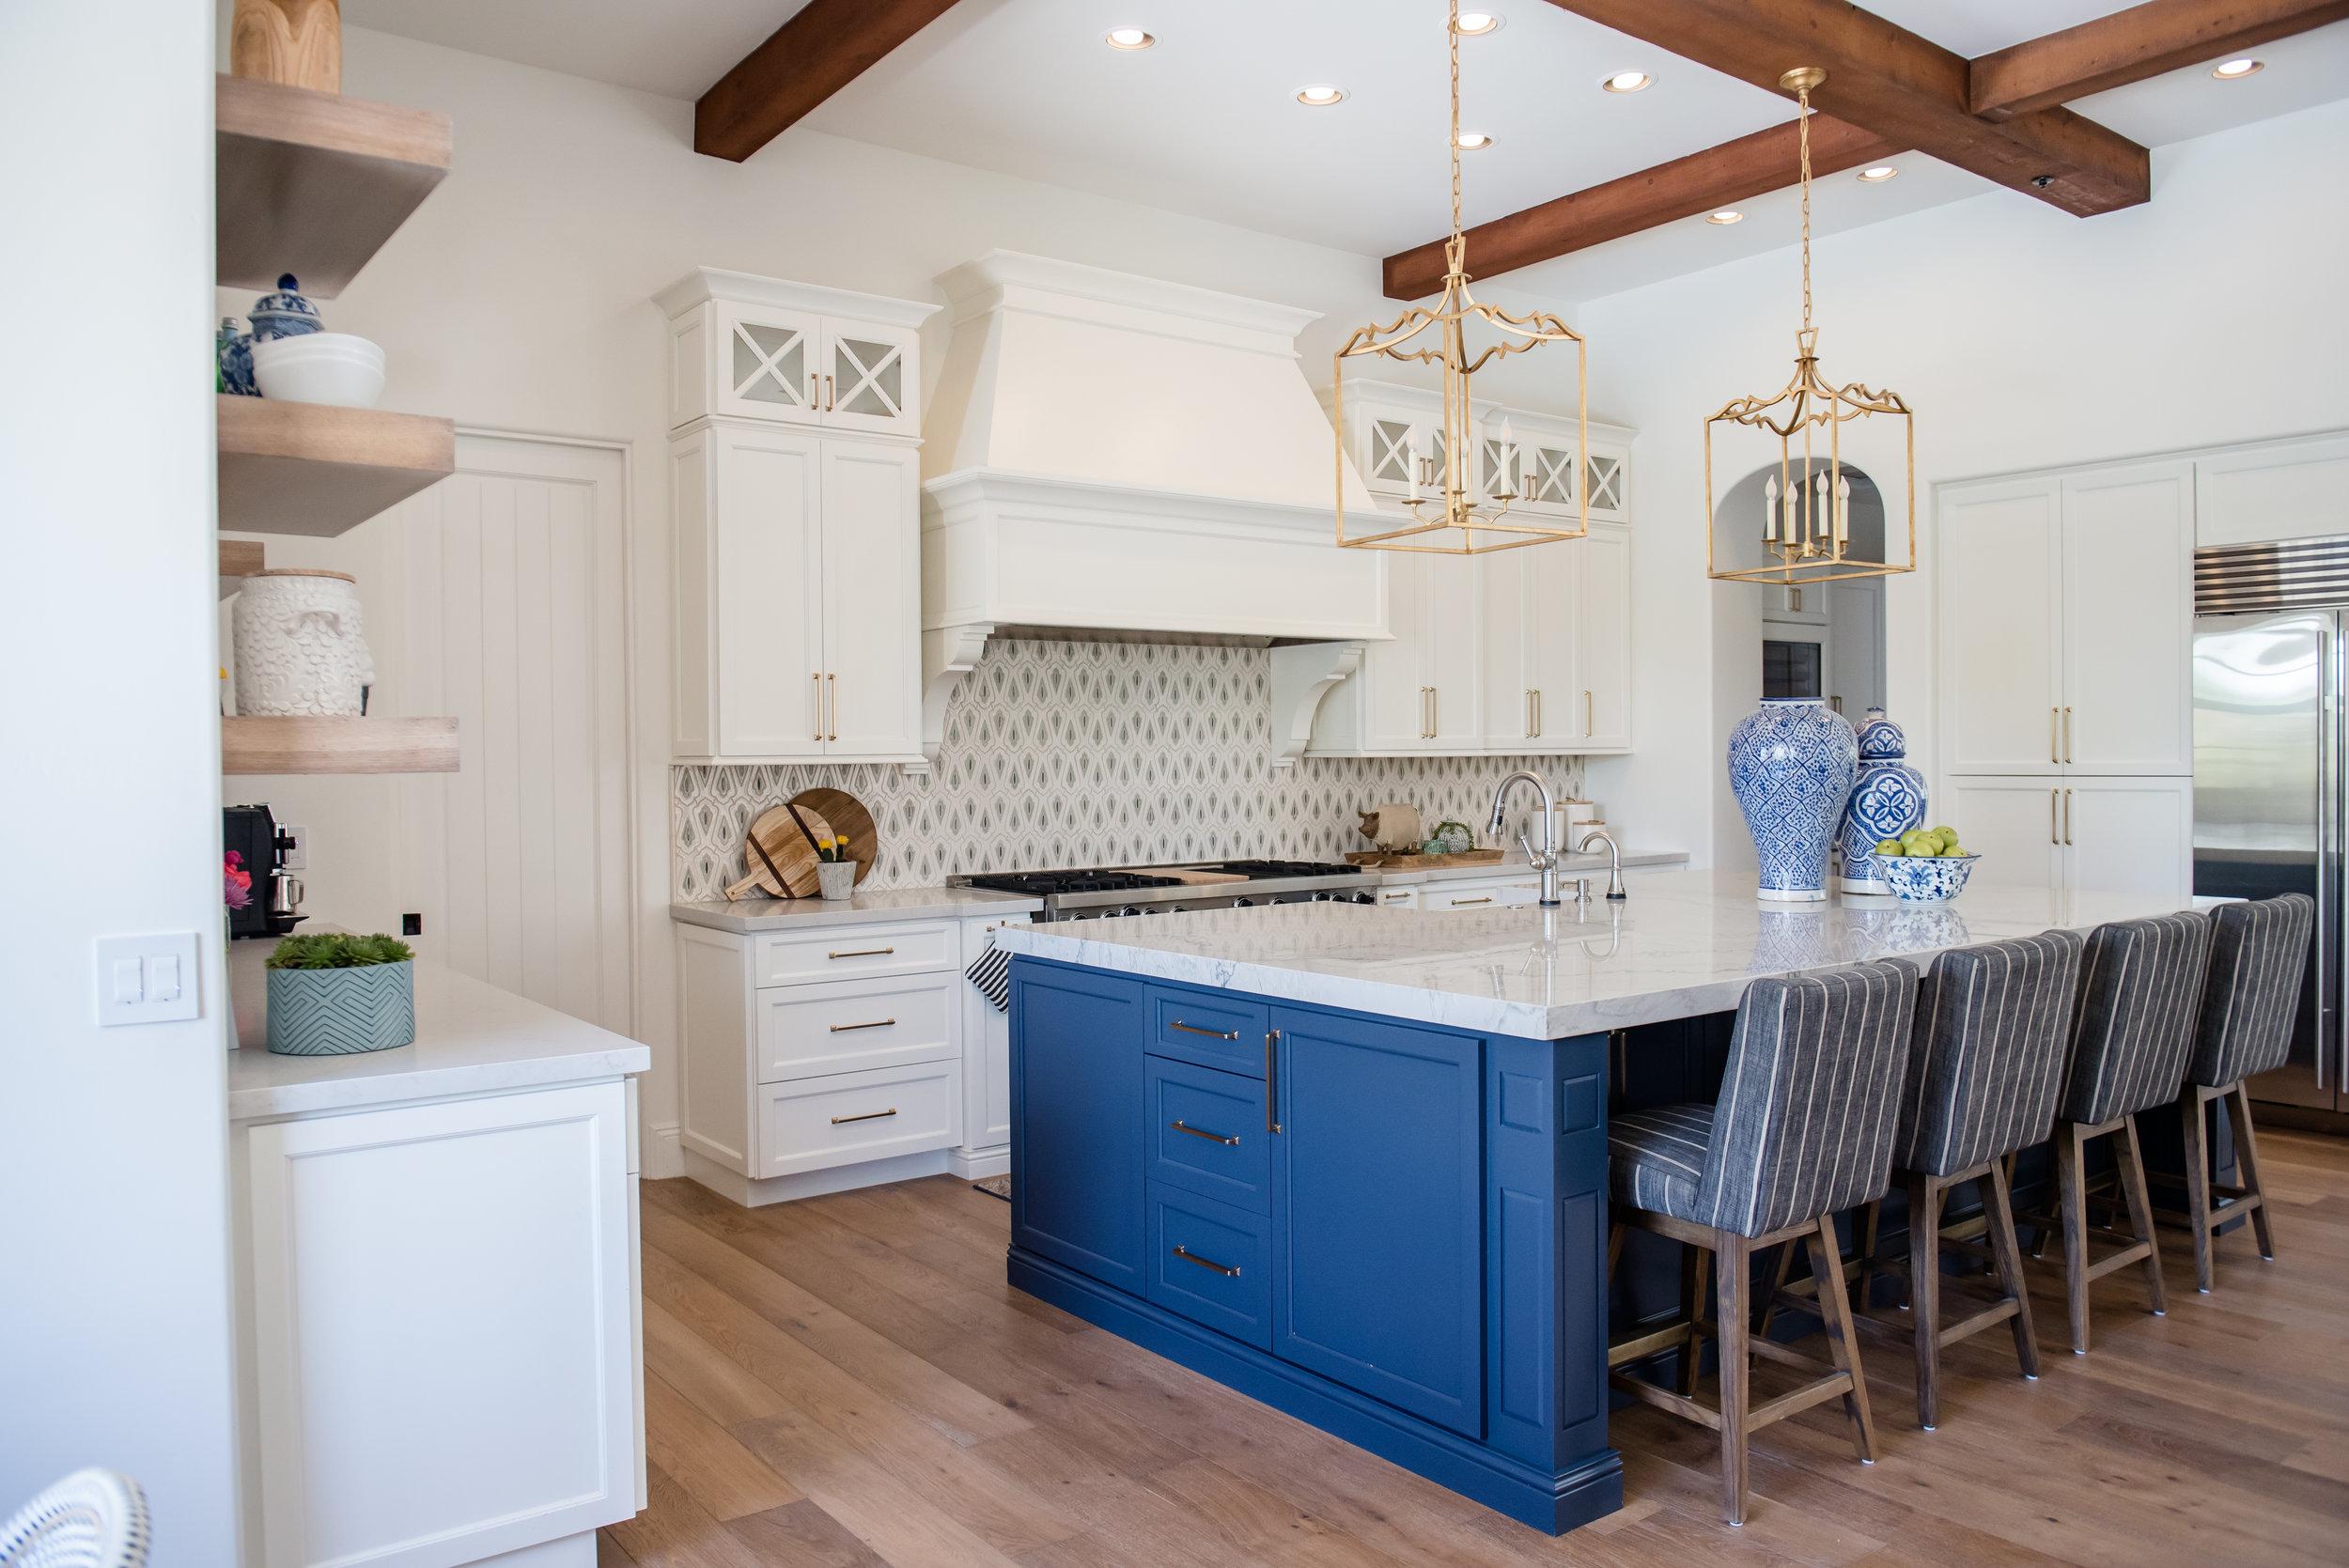 23+kitchen+hood+pots+stripedstools+navyblueisland+backsplashtile+openshelves+pendants+brasslighting.jpg